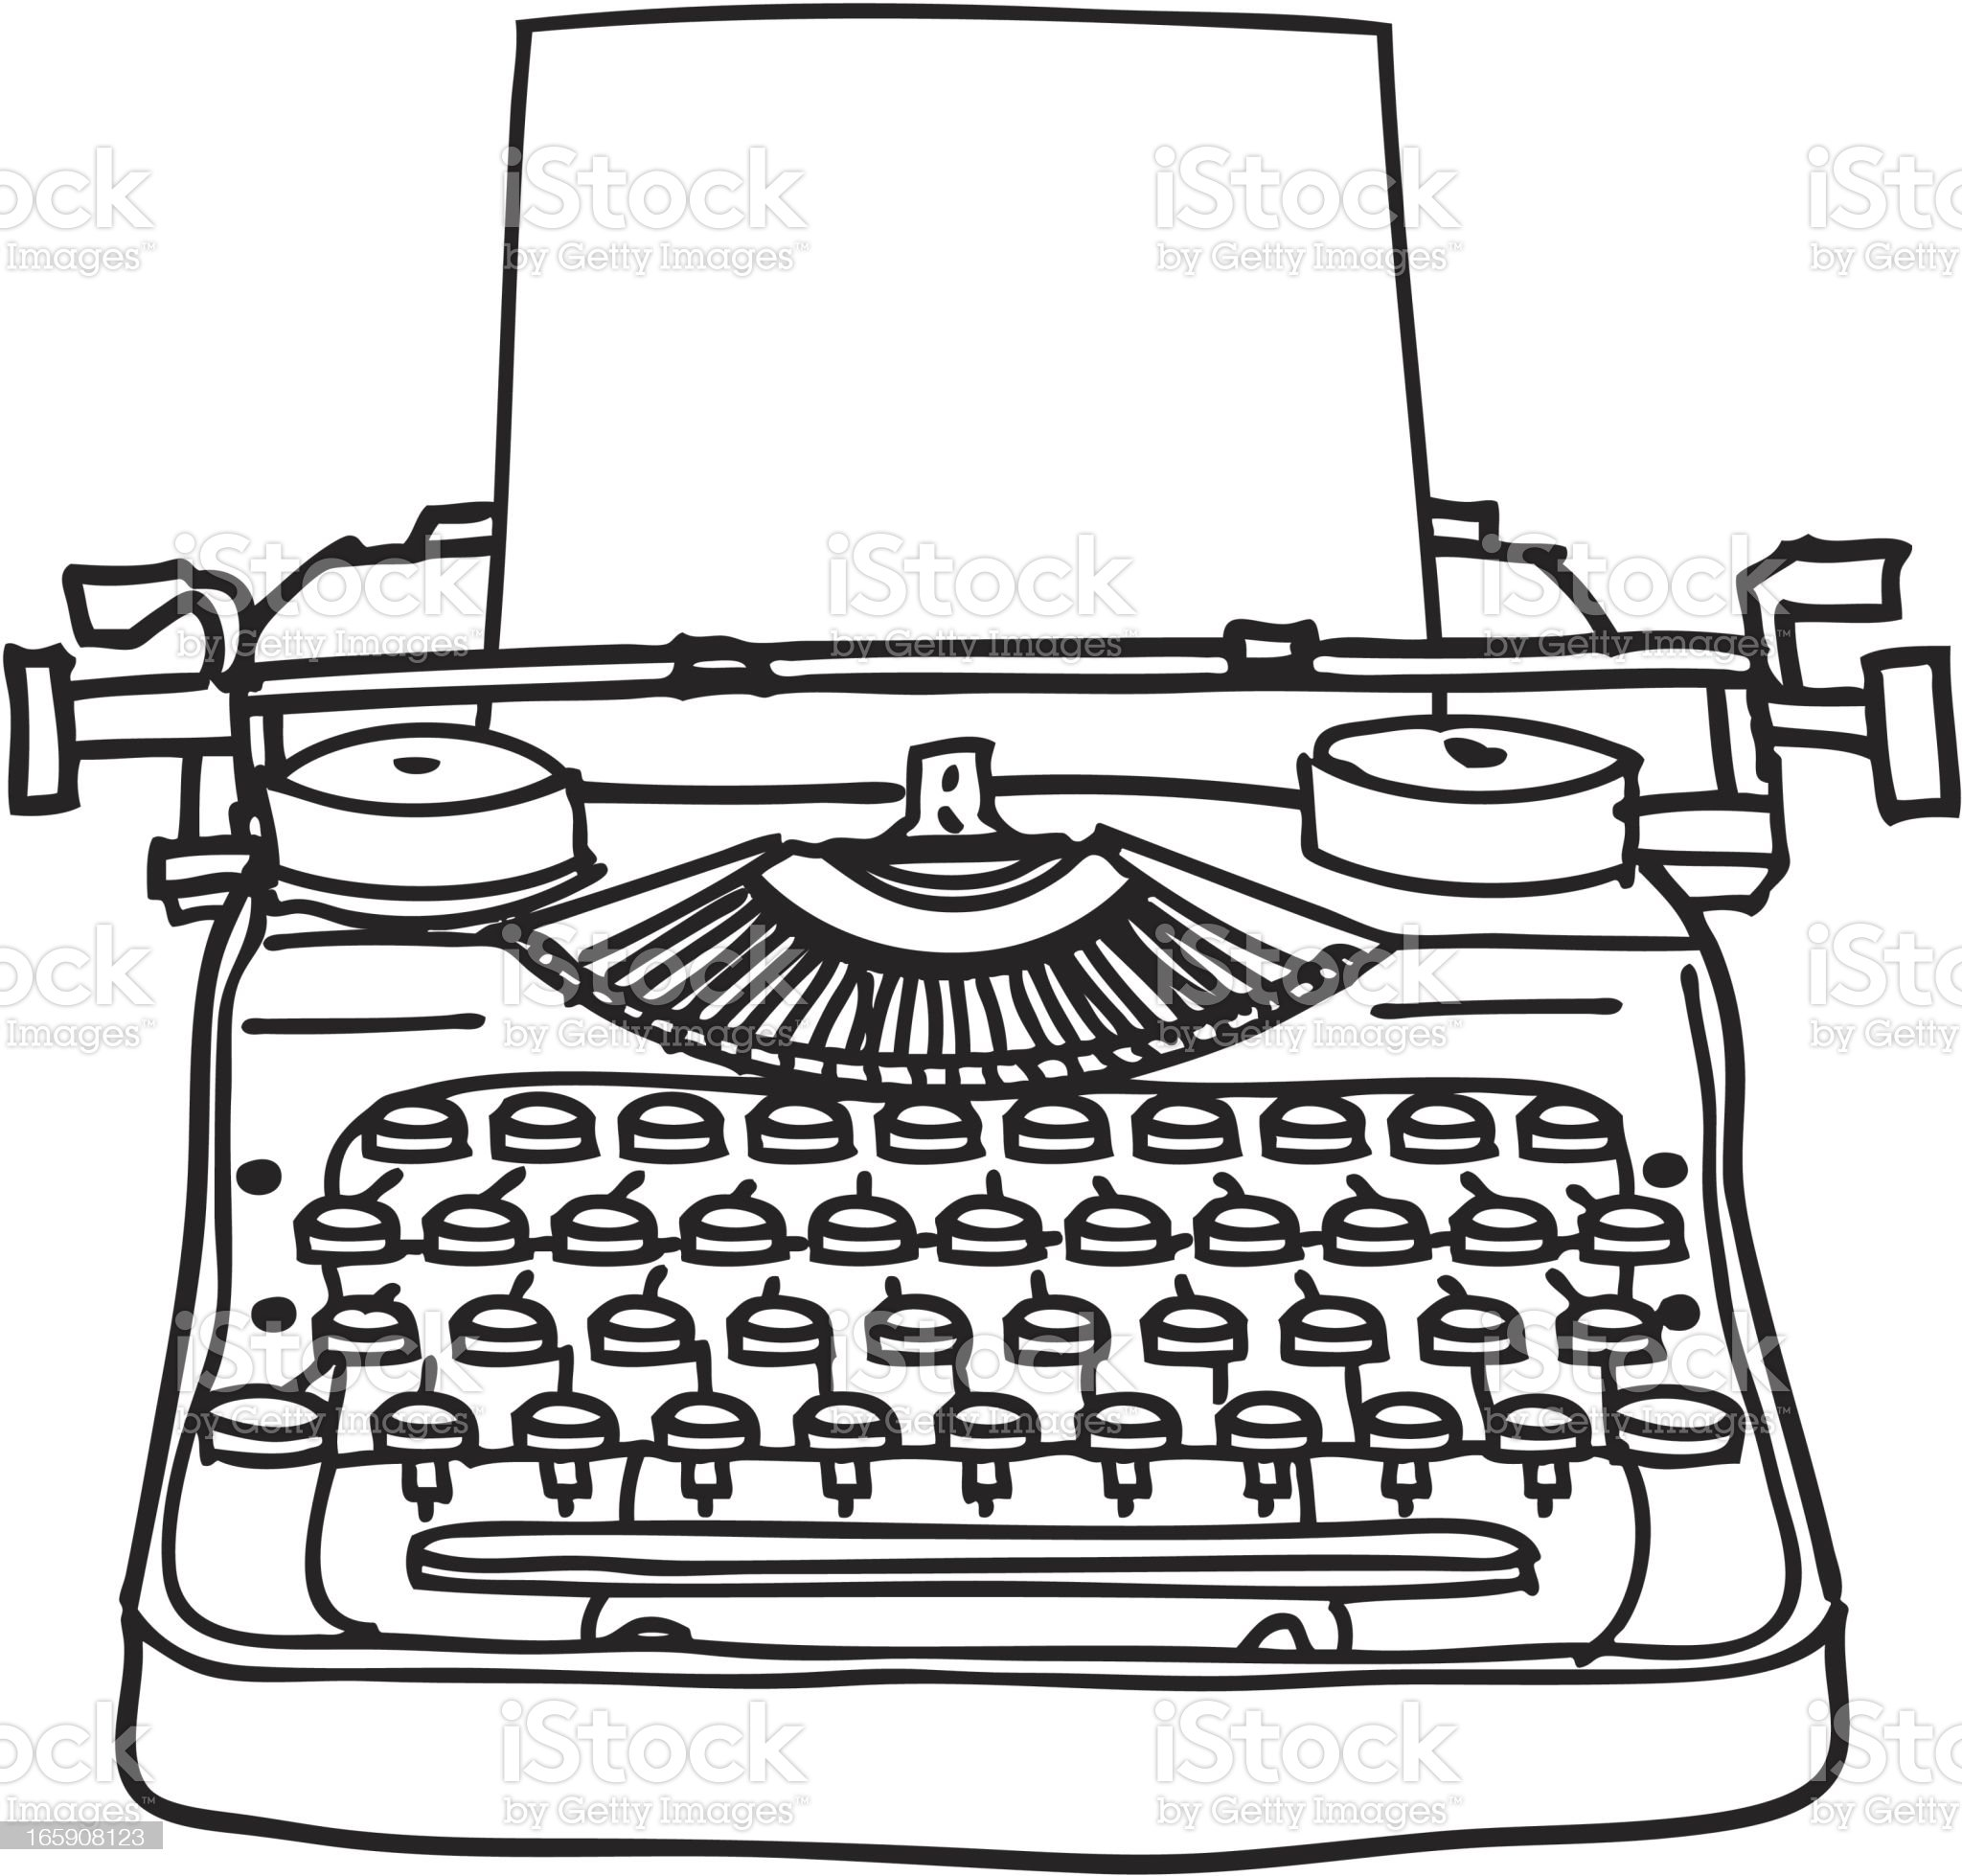 Typewriter Line Drawing royalty-free stock vector art